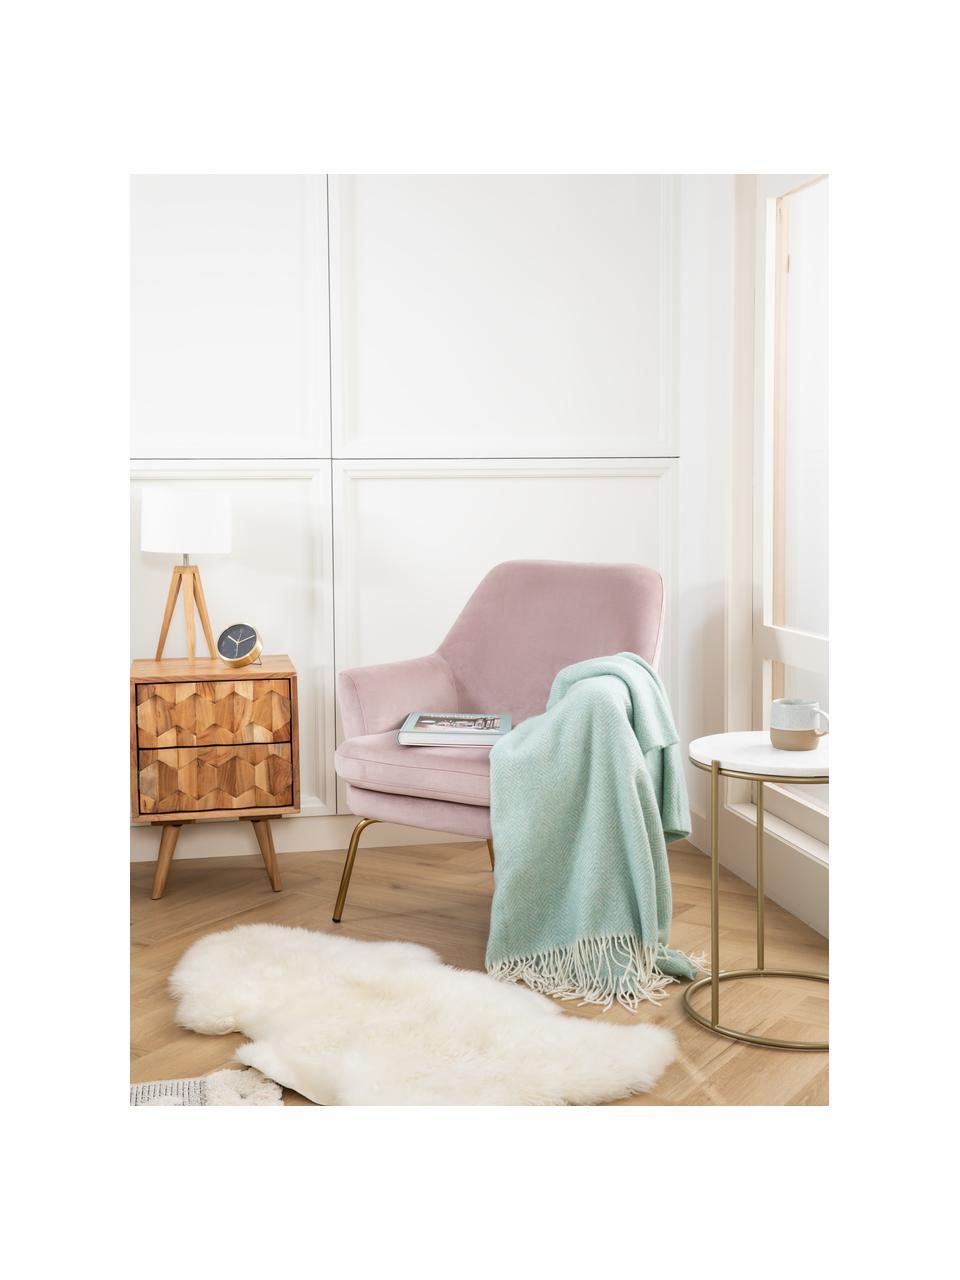 Fluwelen fauteuil Chisa in roze, Bekleding: polyester fluweel, Poten: gelakt metaal, Fluweel roze, B 68 x D 73 cm